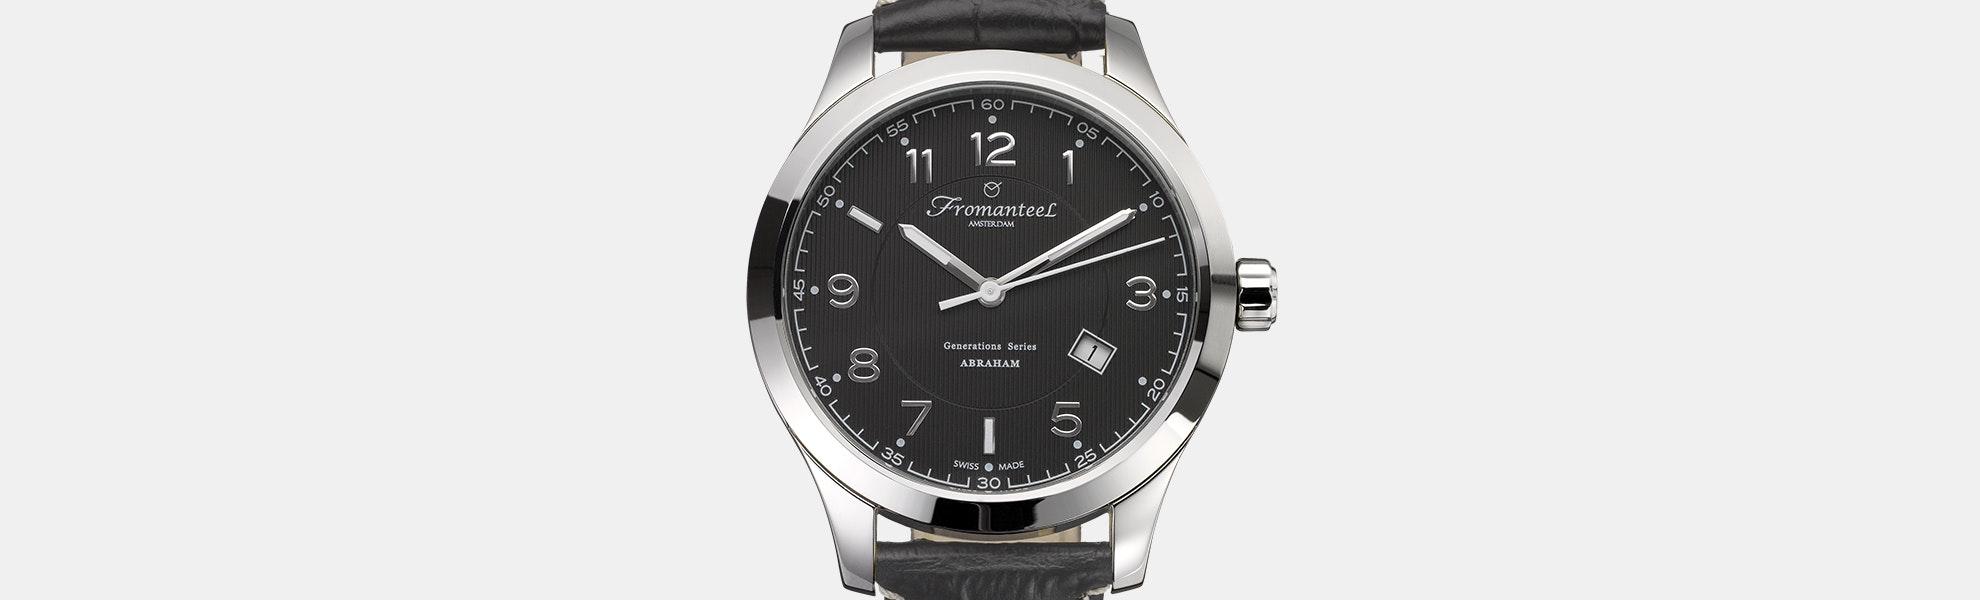 Fromanteel Generations Abraham Quartz Watch